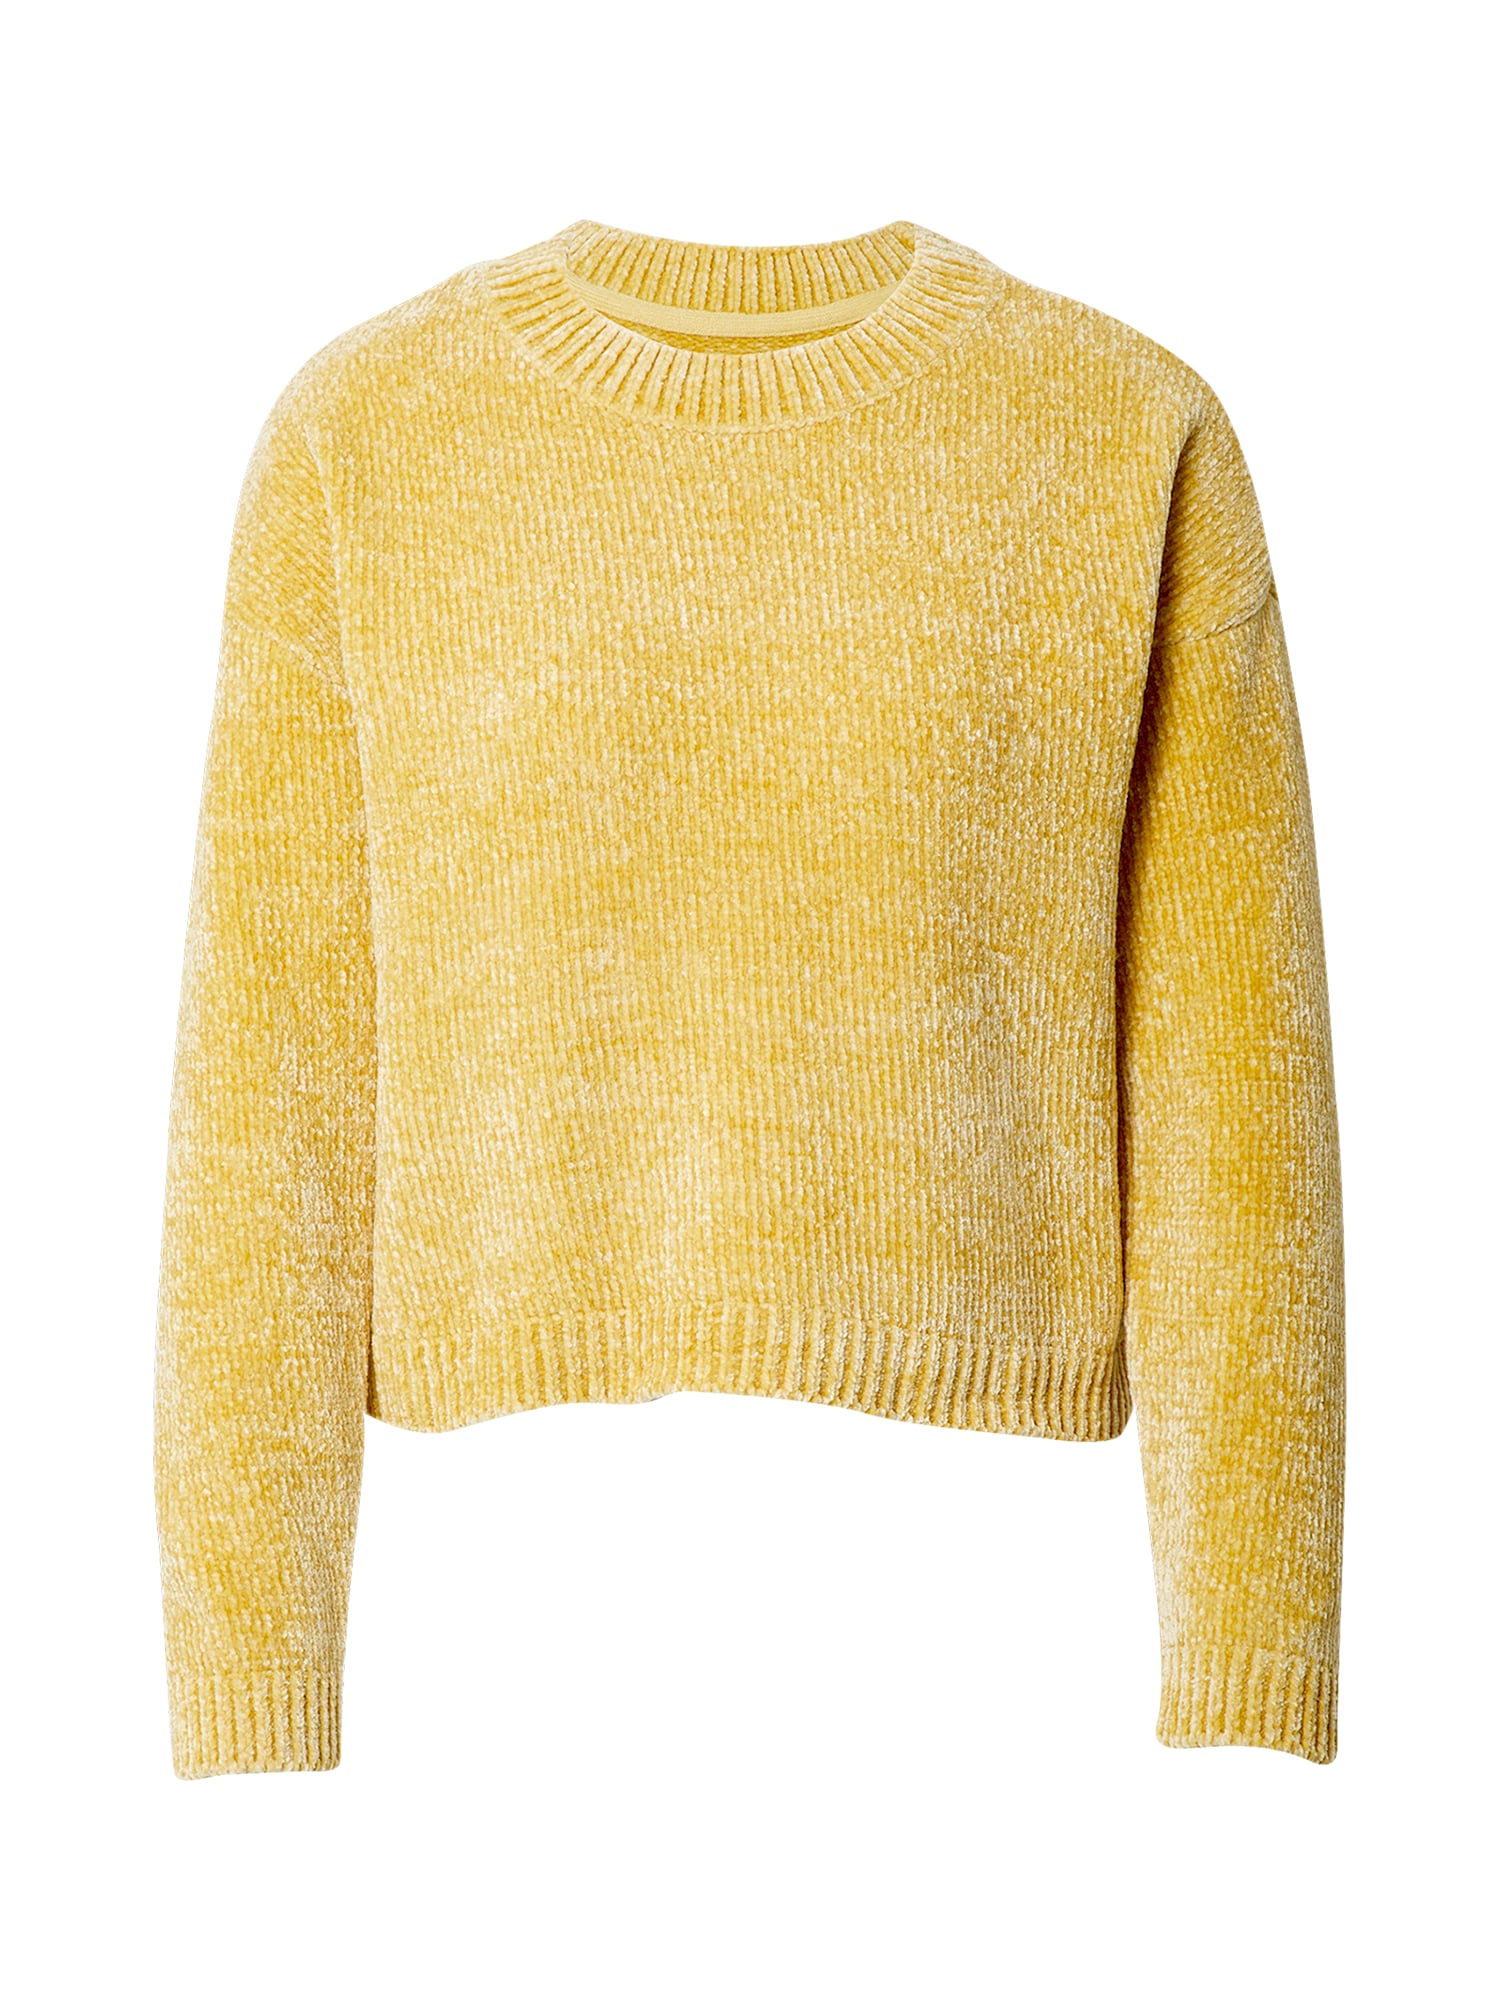 ONLY Megztinis 'Ancia' garstyčių spalva